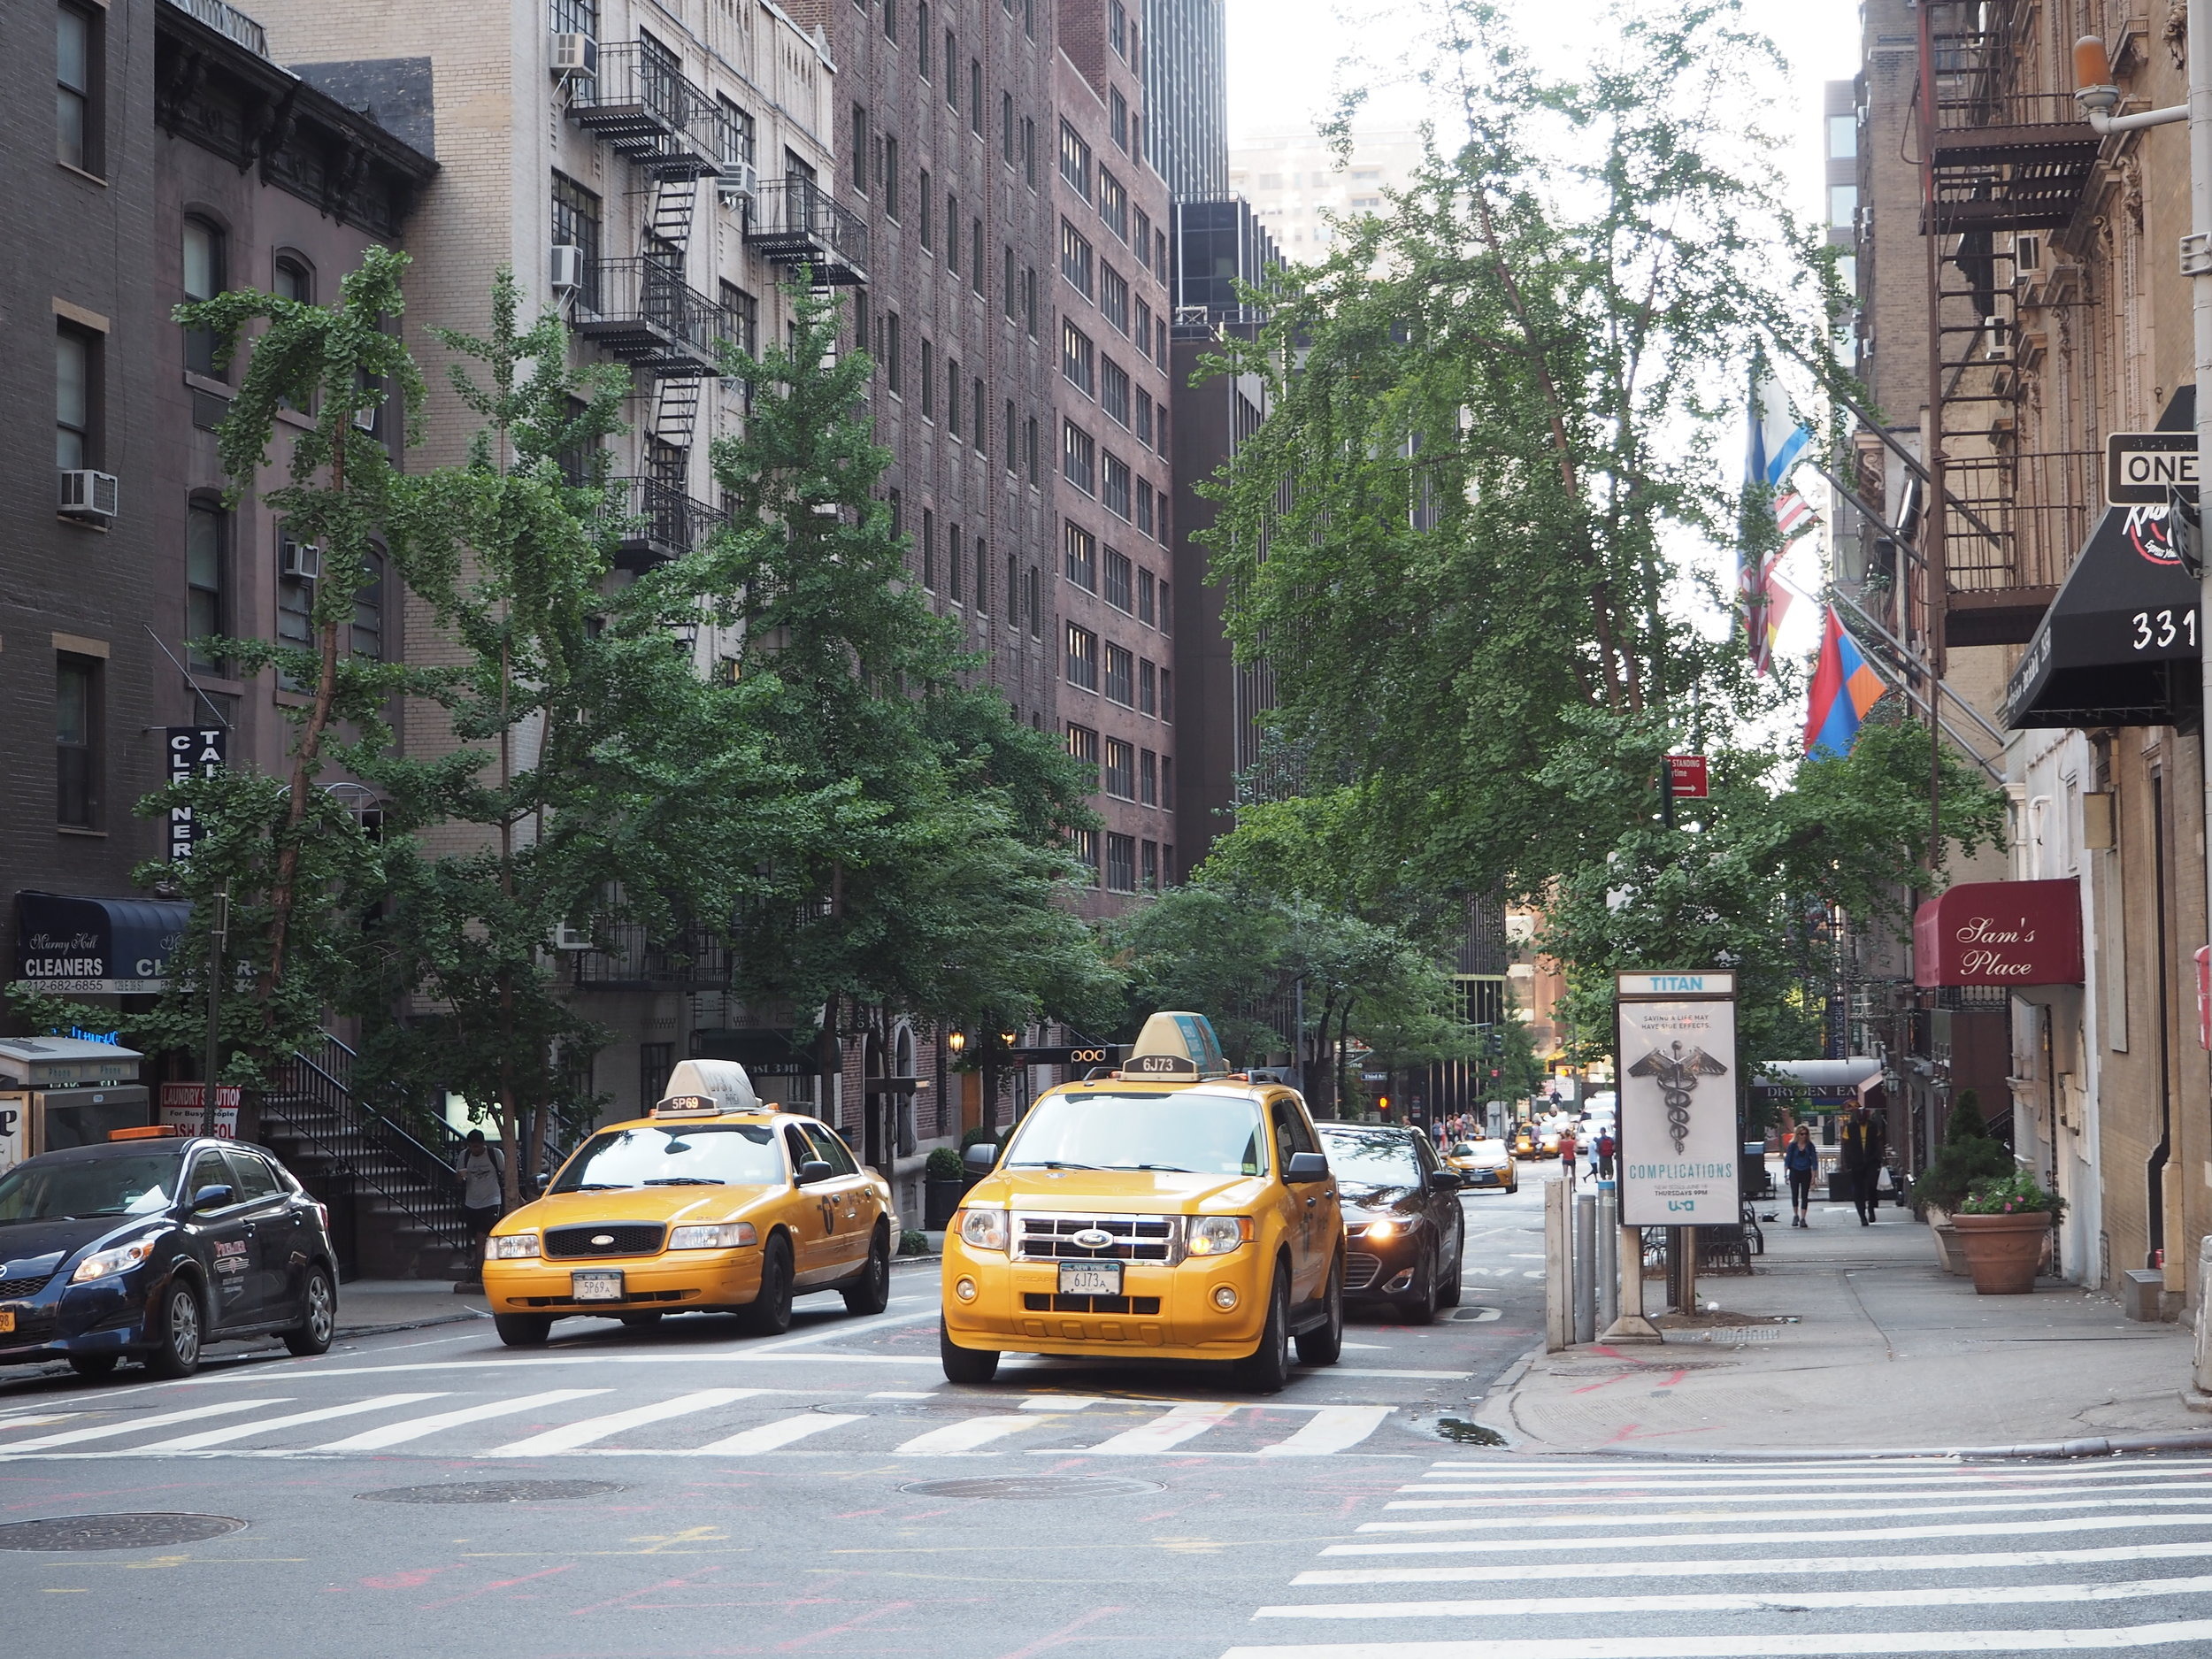 NYC_2015_0396.JPG